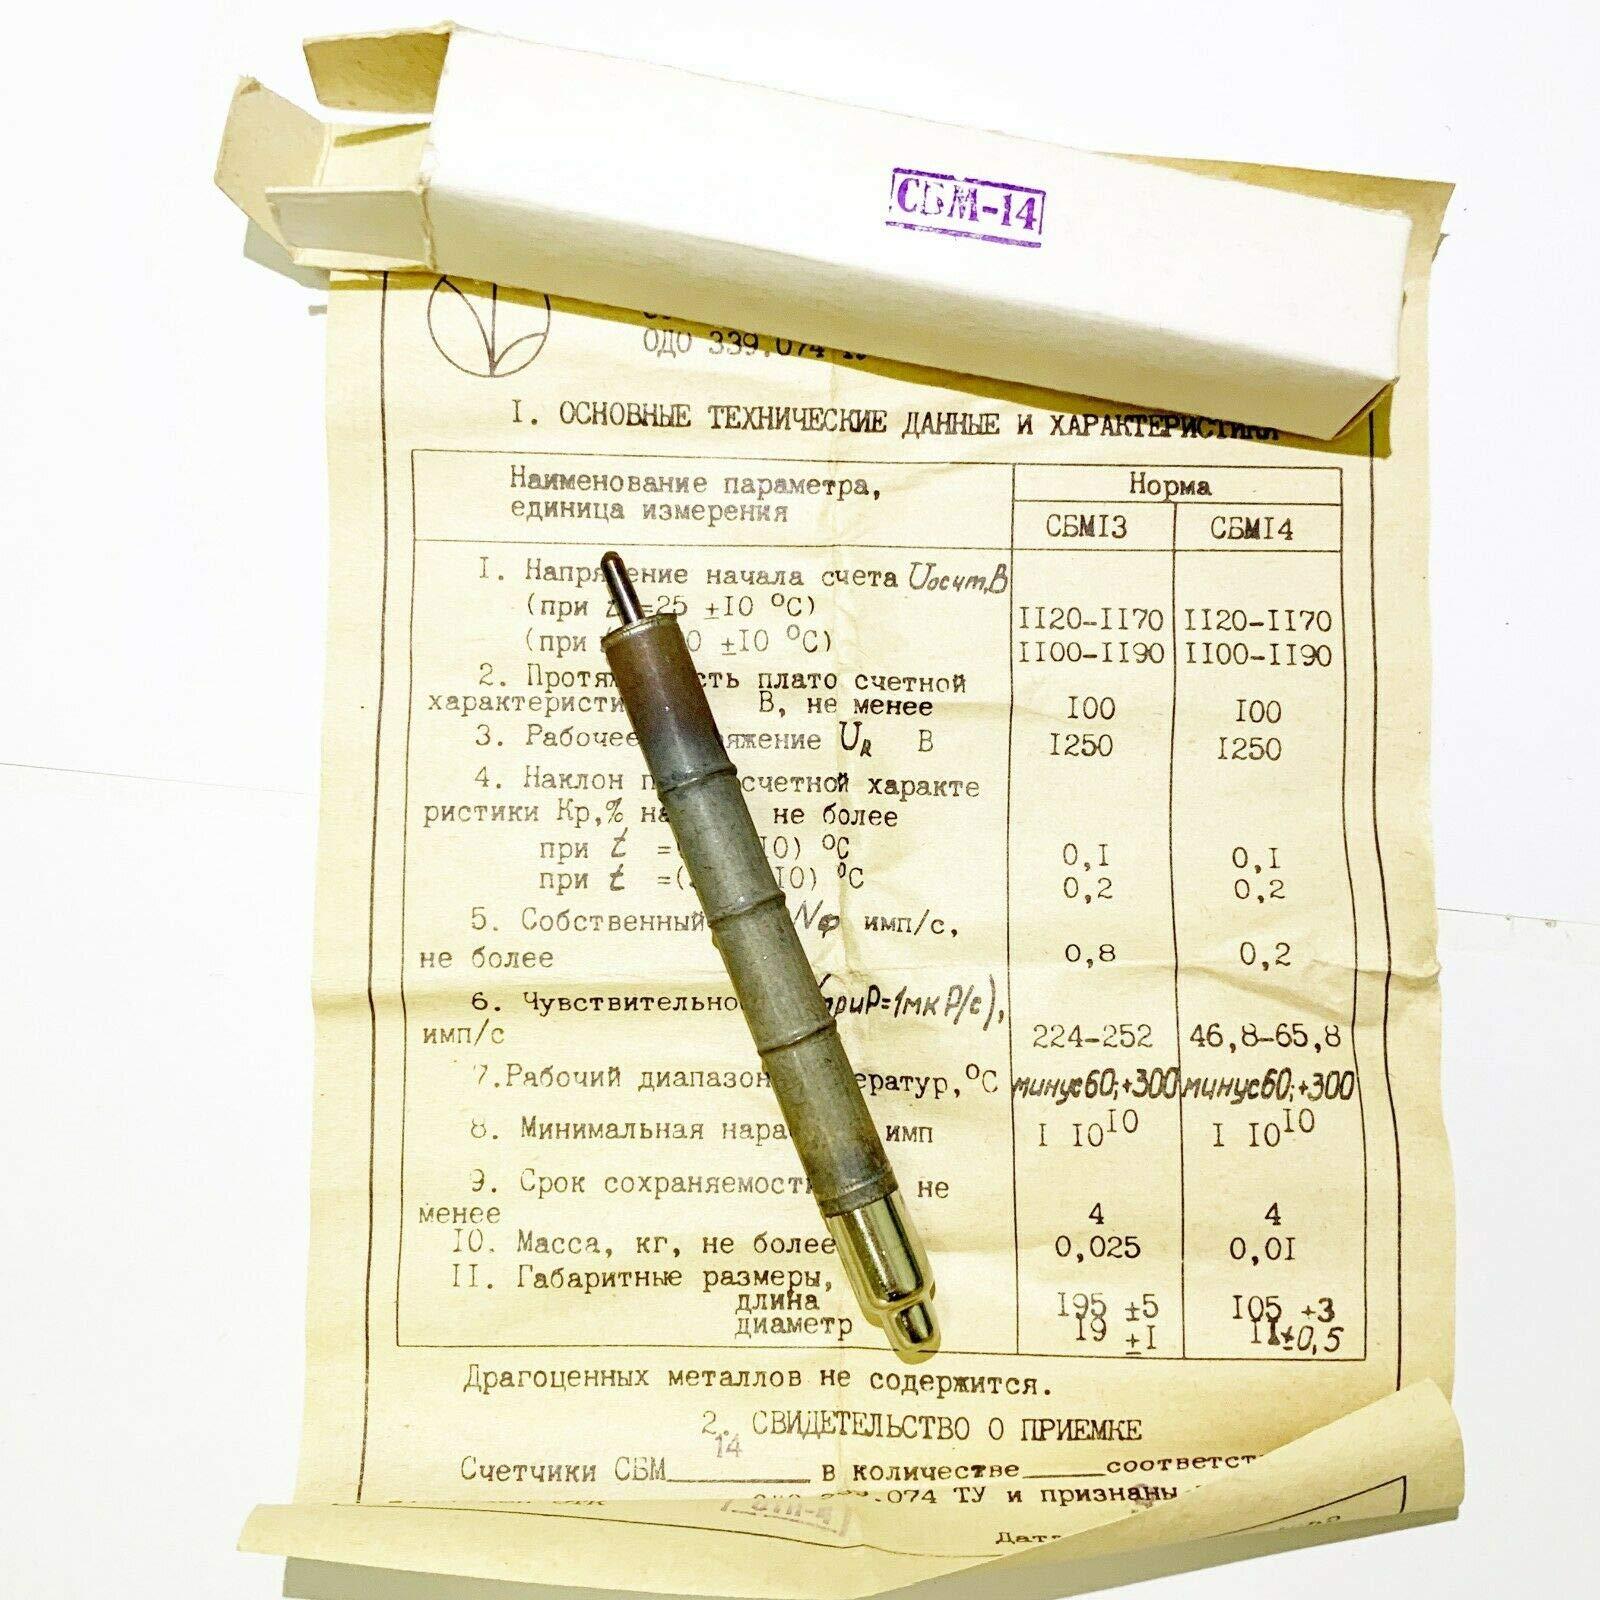 Vintage Geiger Counter SBM-14 Tube Gamma and Betta Radiation NOS